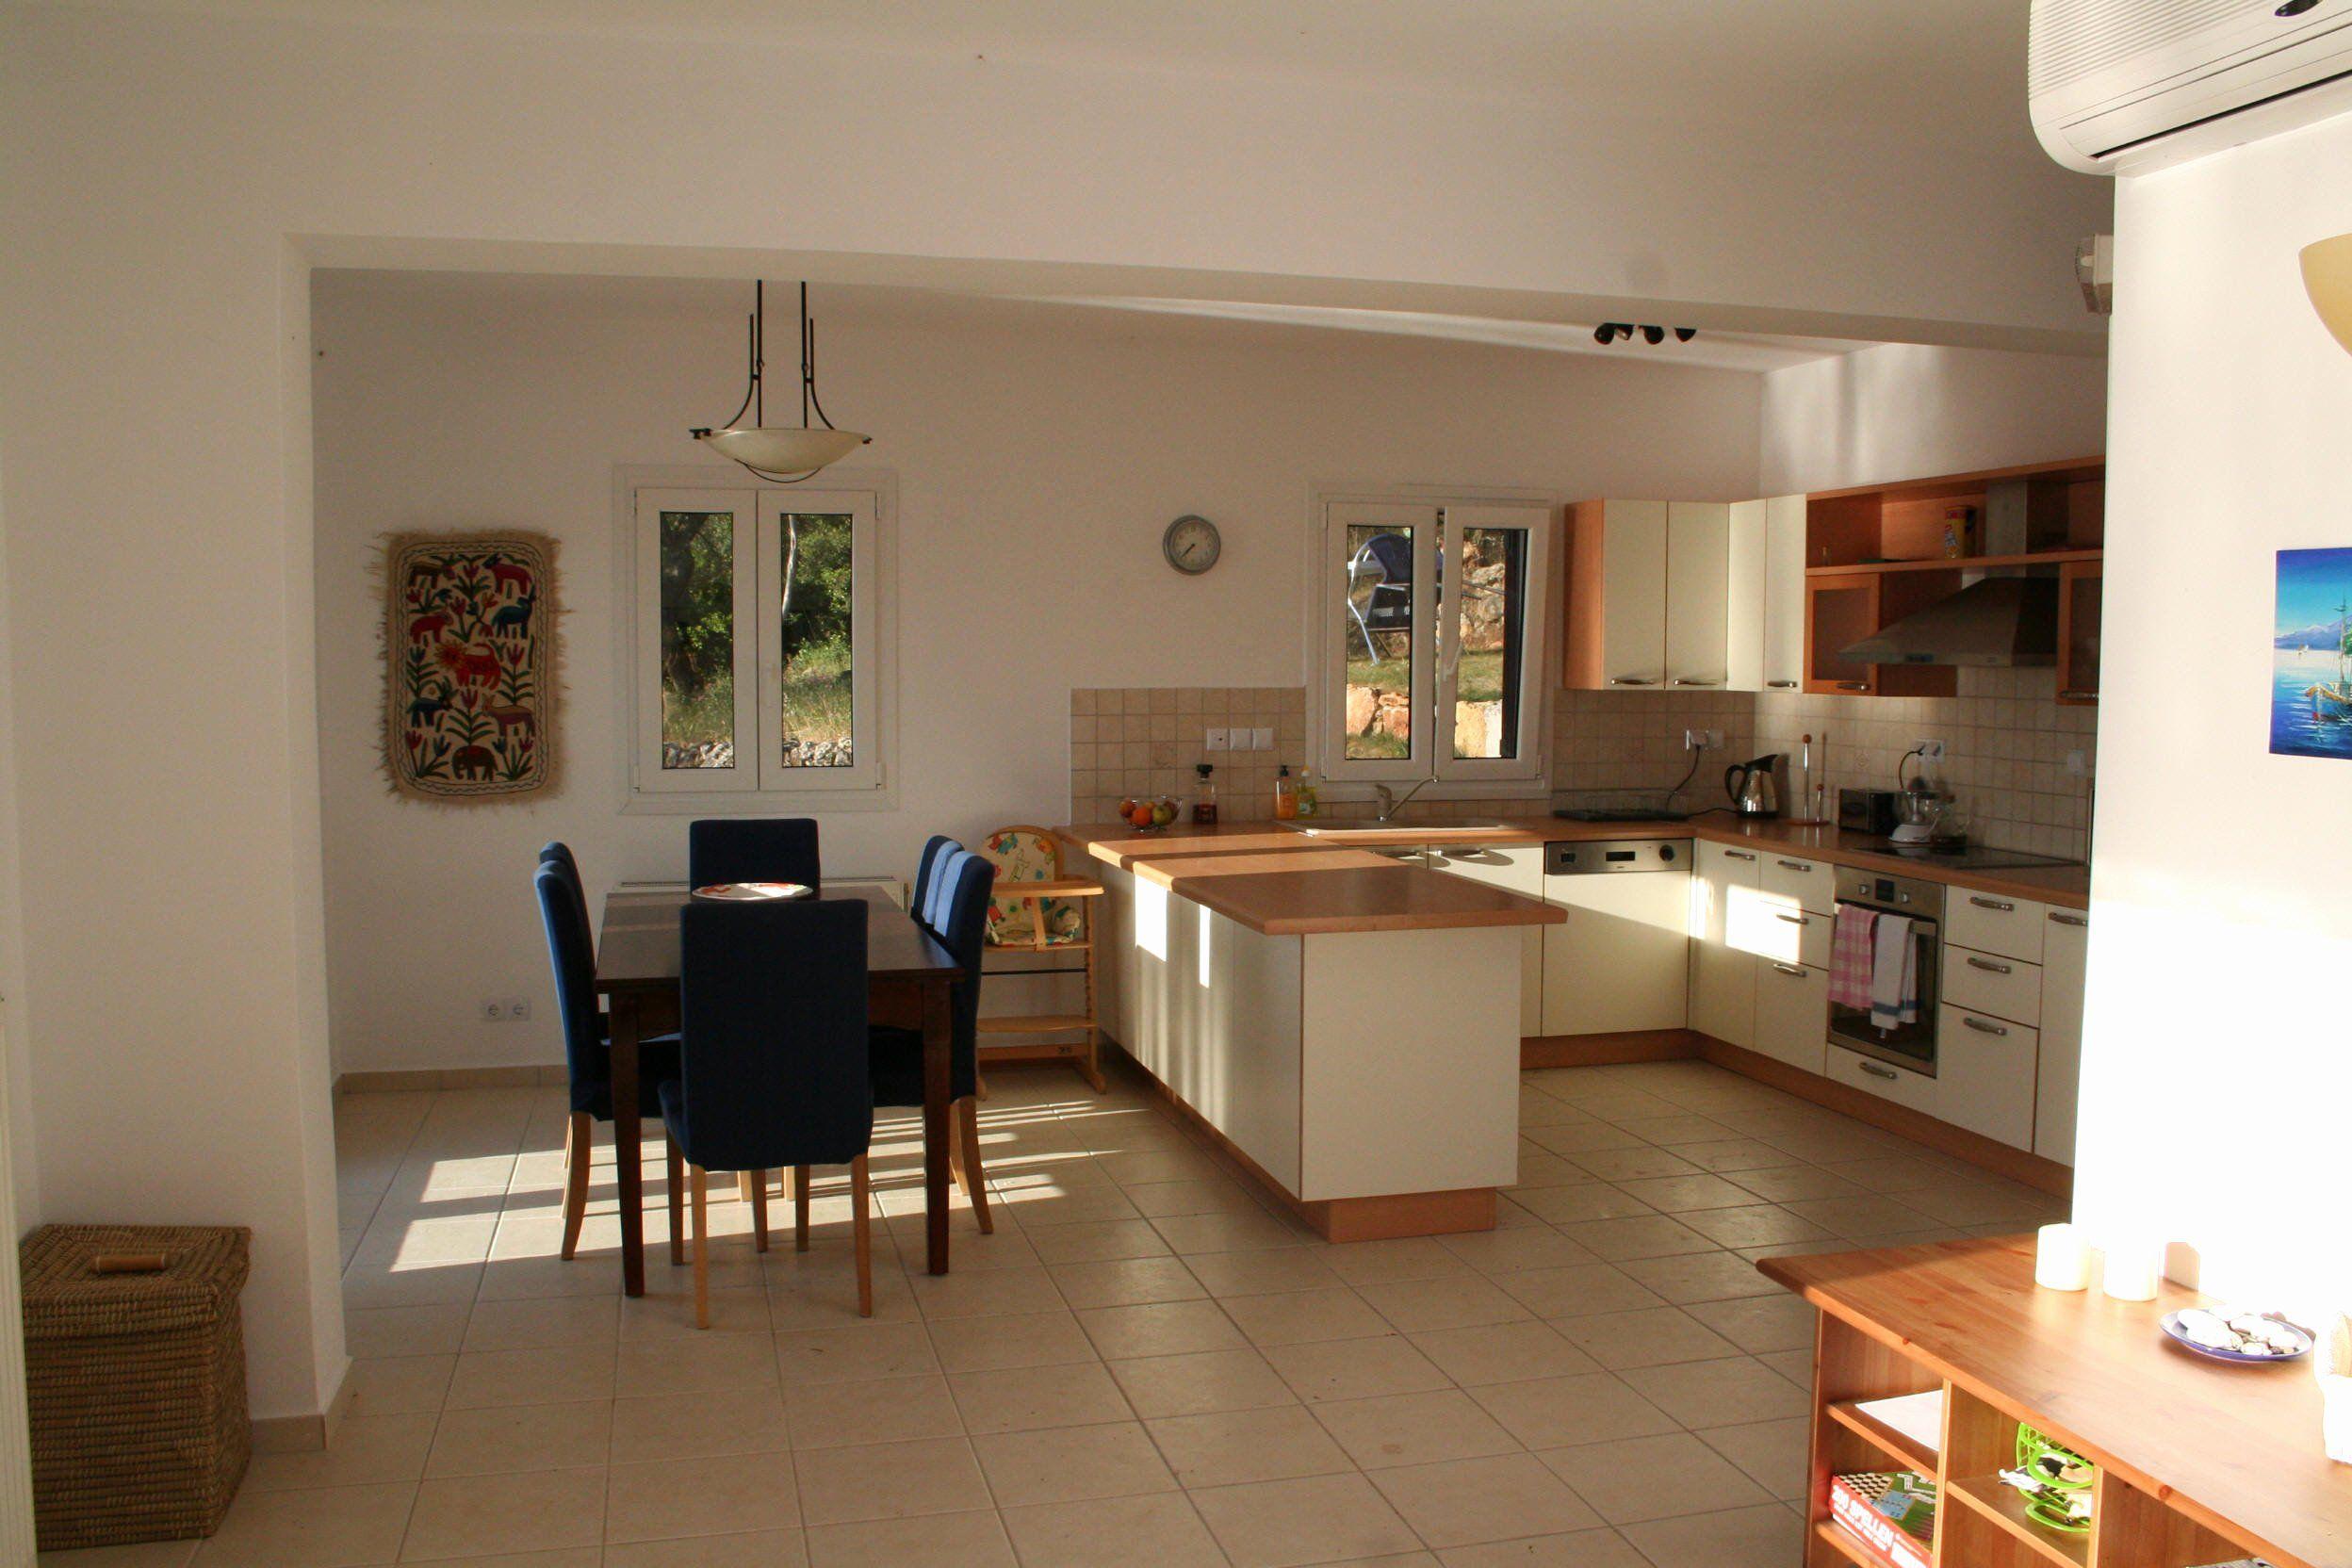 Open Plan Living Dining Room Idea Unique 20 Best Open Plan Kitchen Livi Living Room And Kitchen Design Kitchen Design Small Space Open Plan Kitchen Living Room